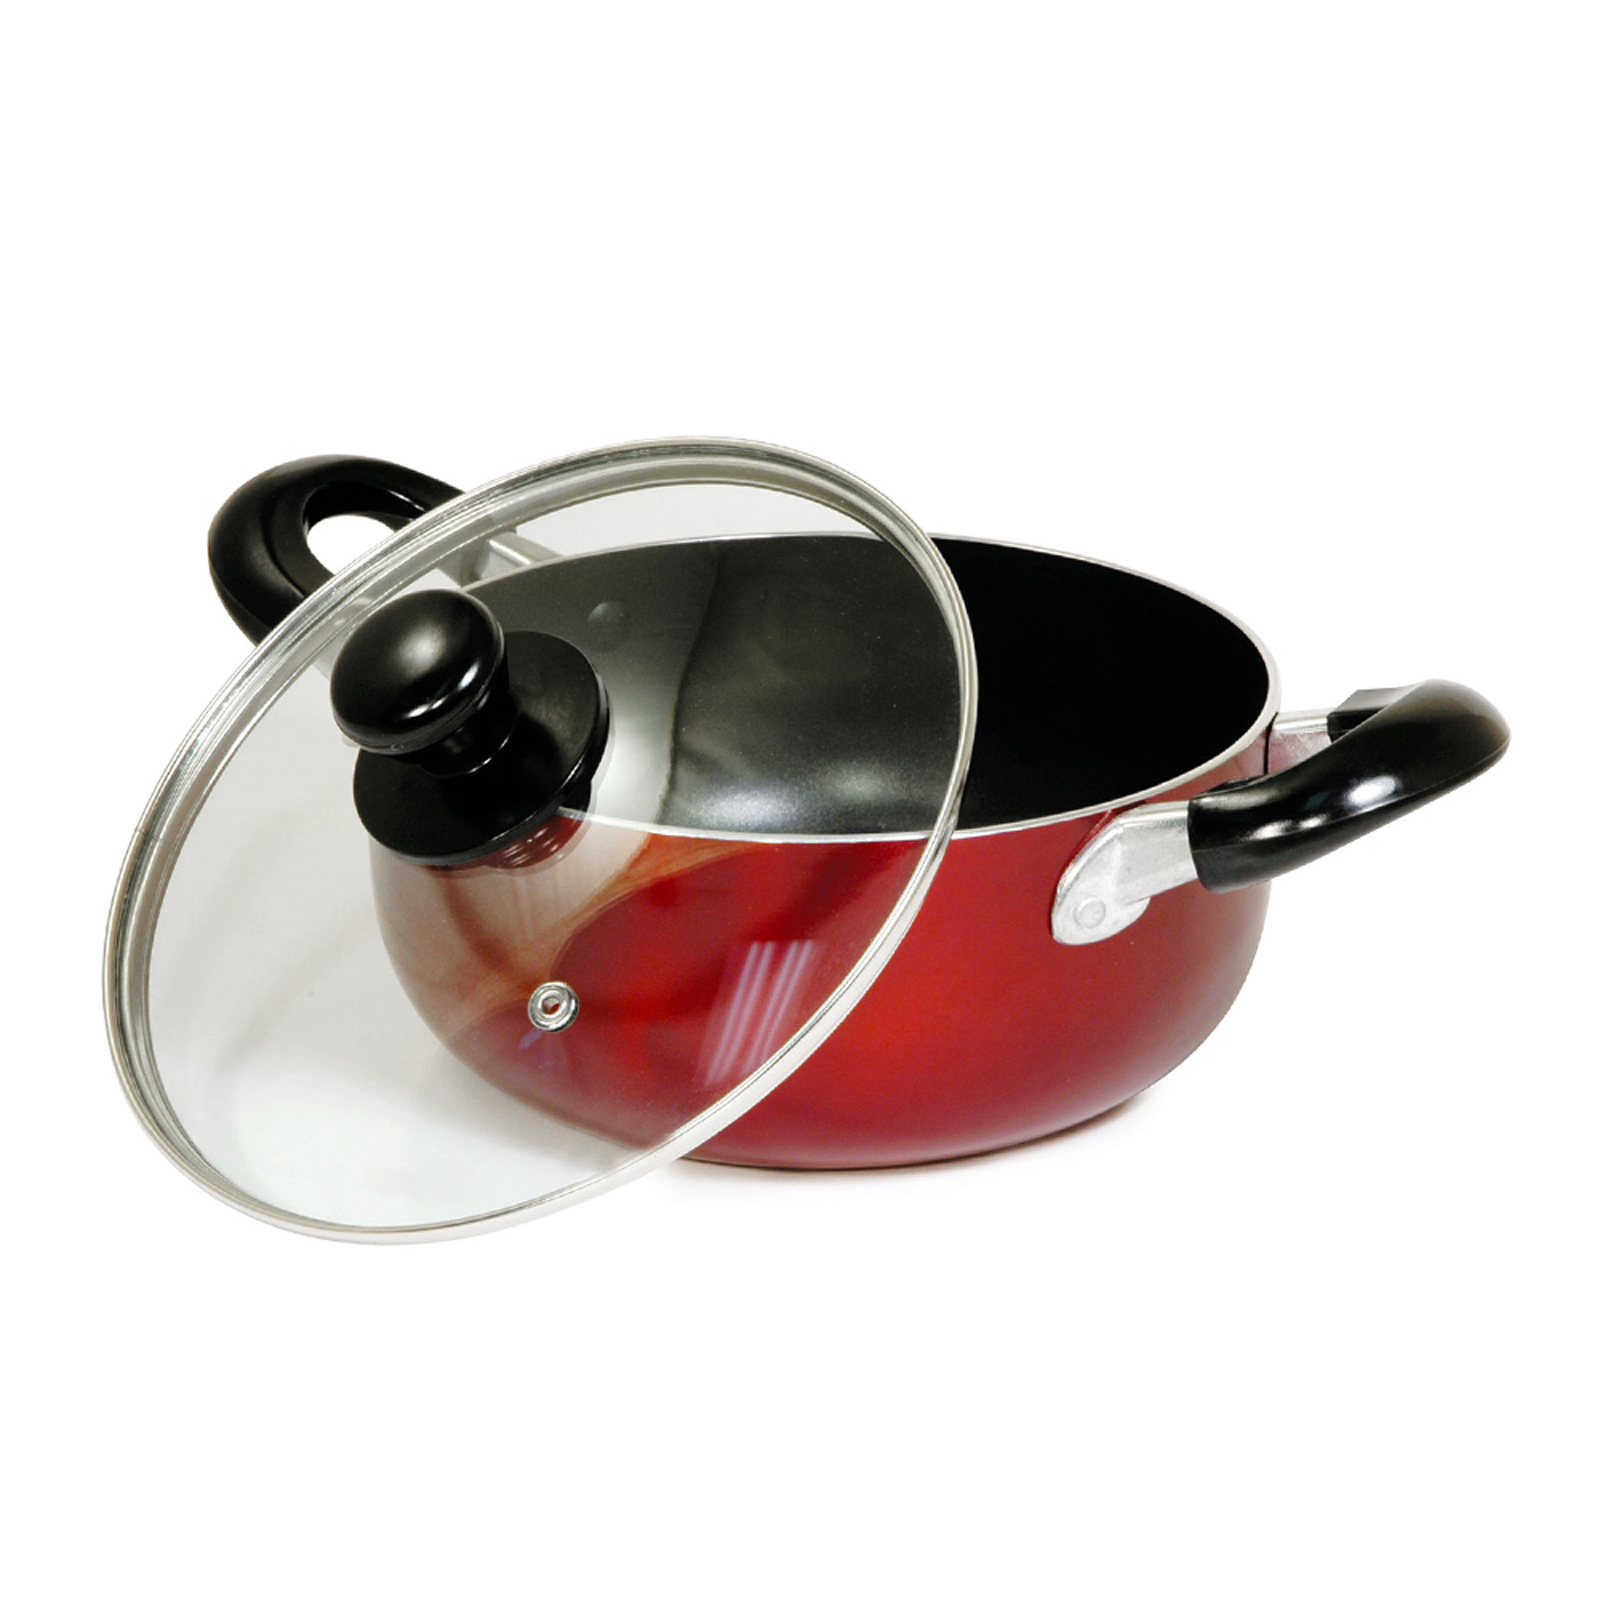 Better Chef 8-Quart Aluminum Dutch Oven by